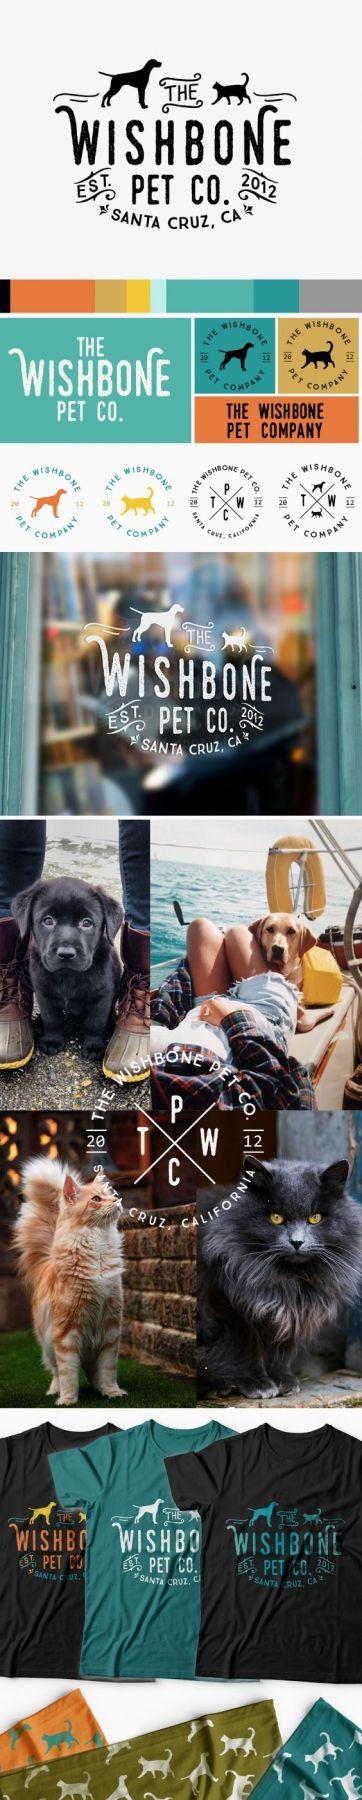 pet shop branding, dog, cat, logo design, pet shop, custom logo, turquoise, aqua, teal, orange, yellow, grey, blue, green, palette, modern, rustic, clean, badge, wishbone, pet, shop